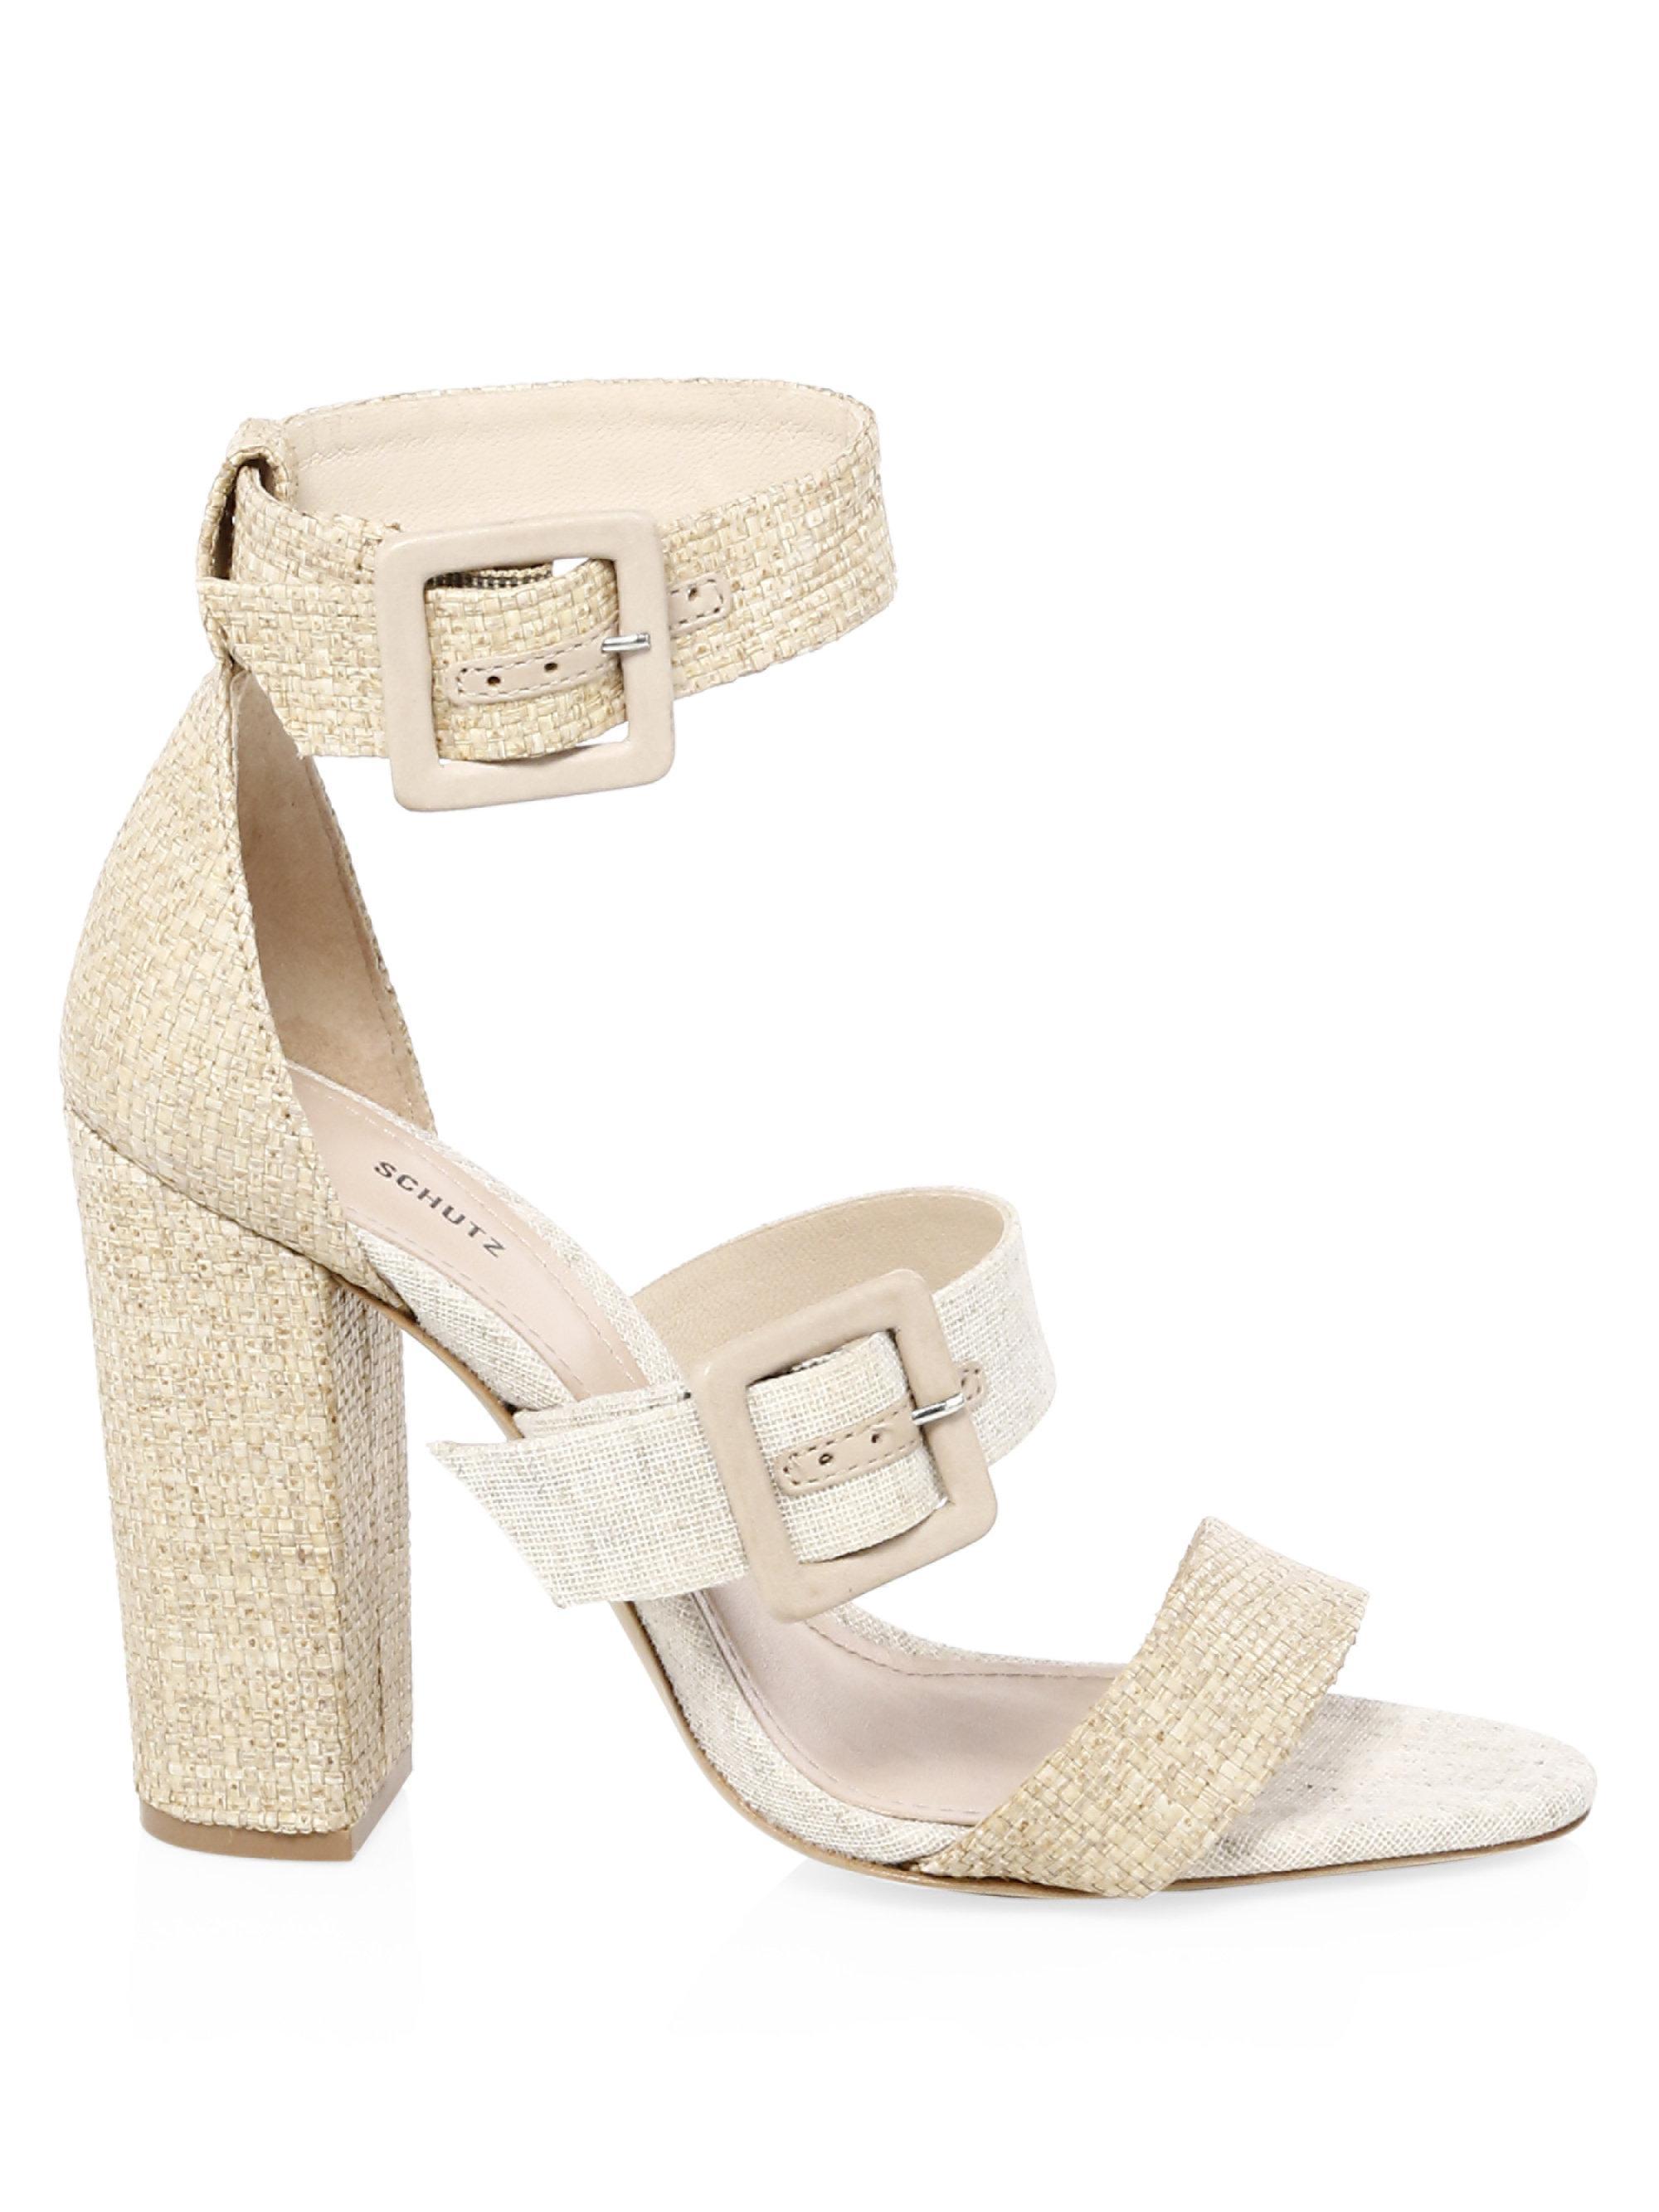 Schutz Sarah Raffia Ankle-Strap Sandals IAgv1ZN